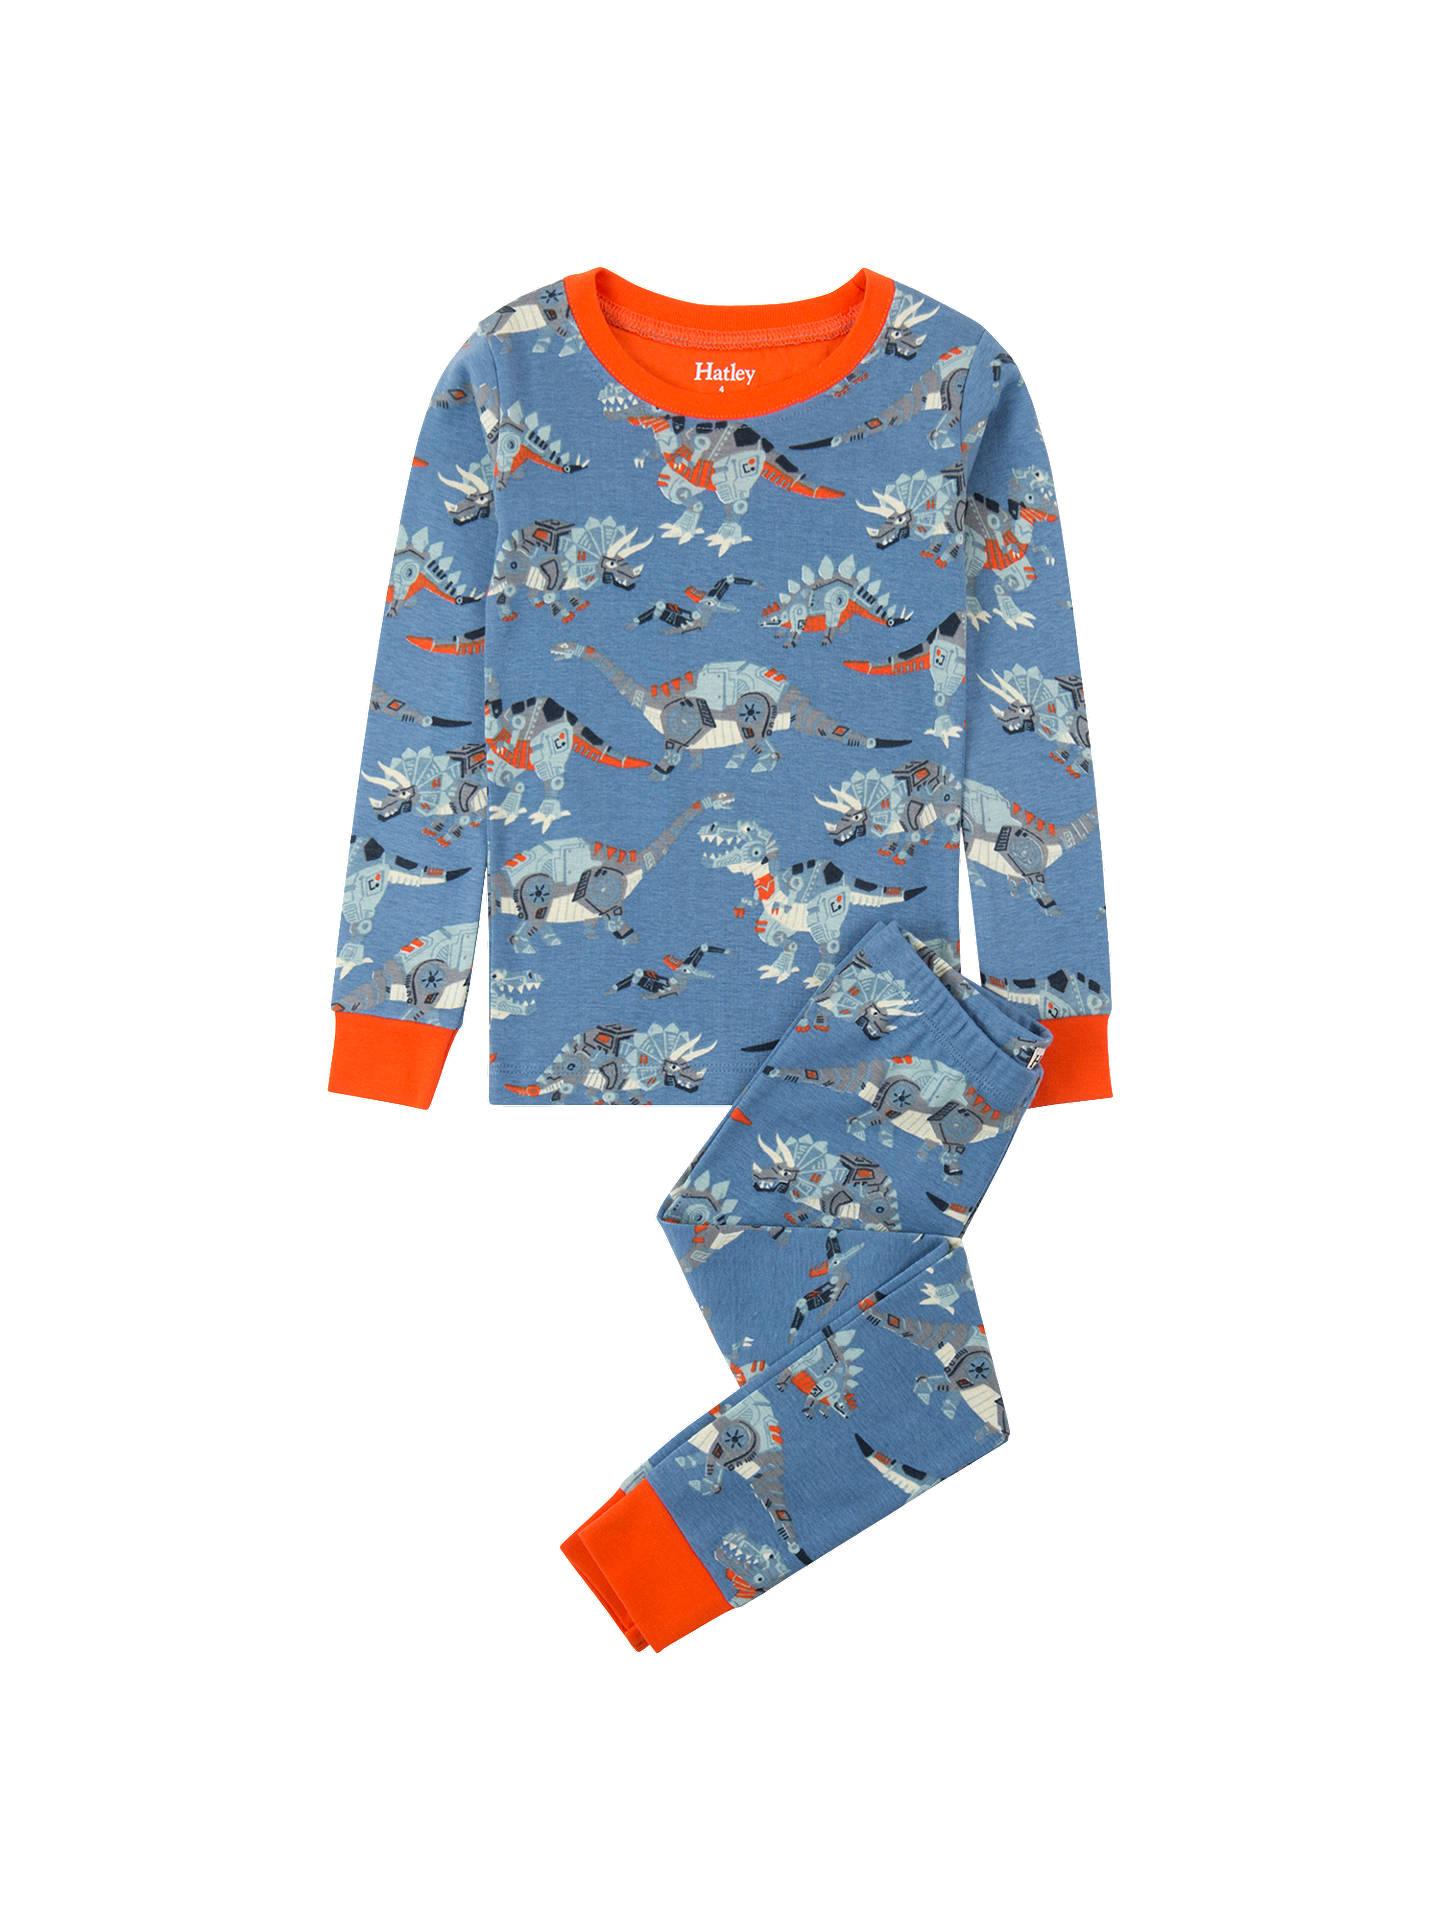 6c50221a3fb9b Buy Hatley Boys' Robotic Dinosaur Long Sleeve Pyjamas, Blue, 2 years Online  at